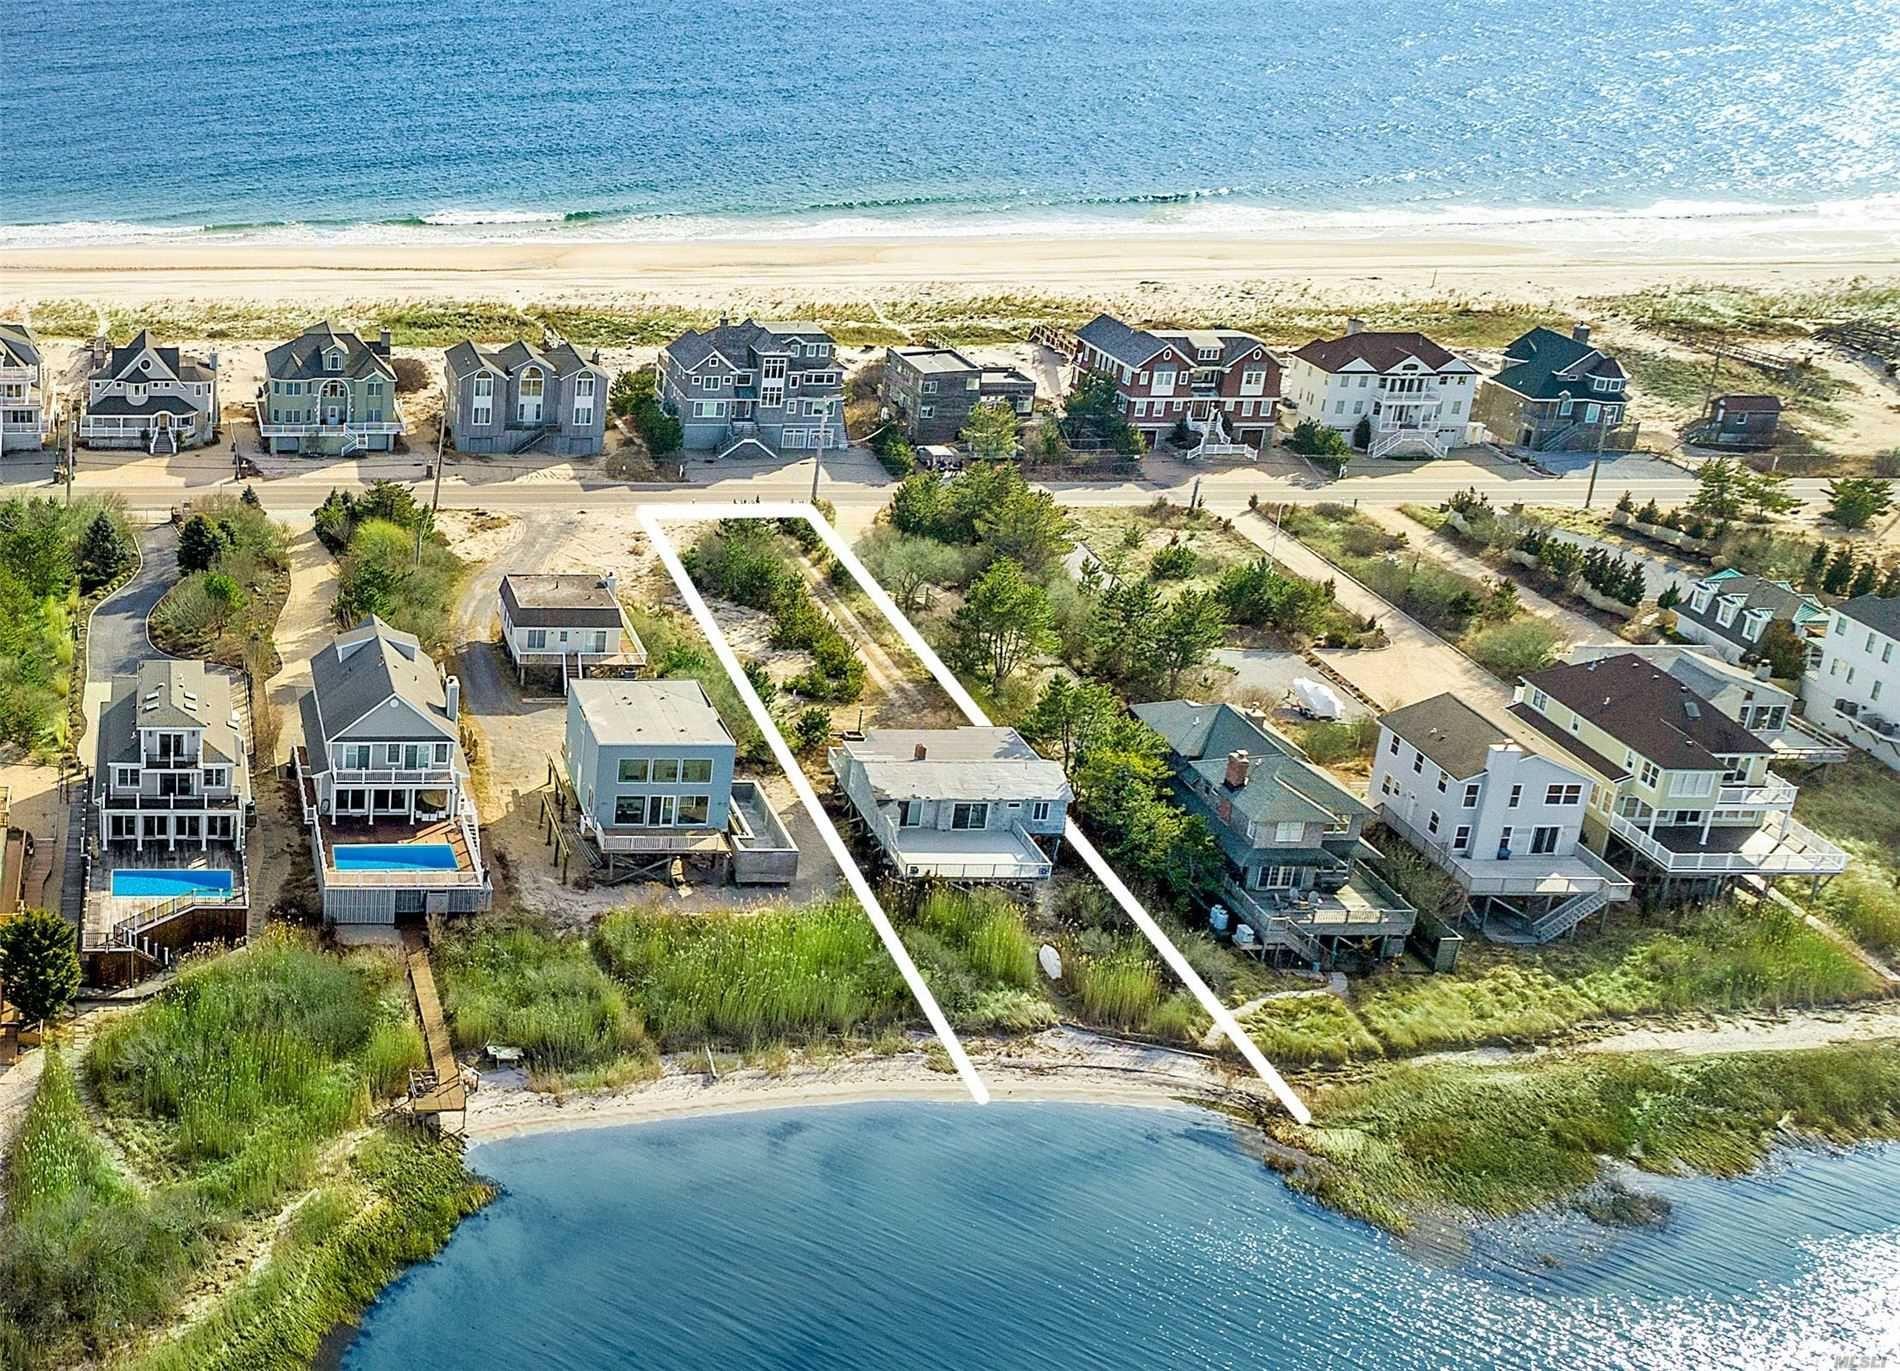 848 Dune Rd, Westhampton Beach, NY 11978 - MLS#: 3210043